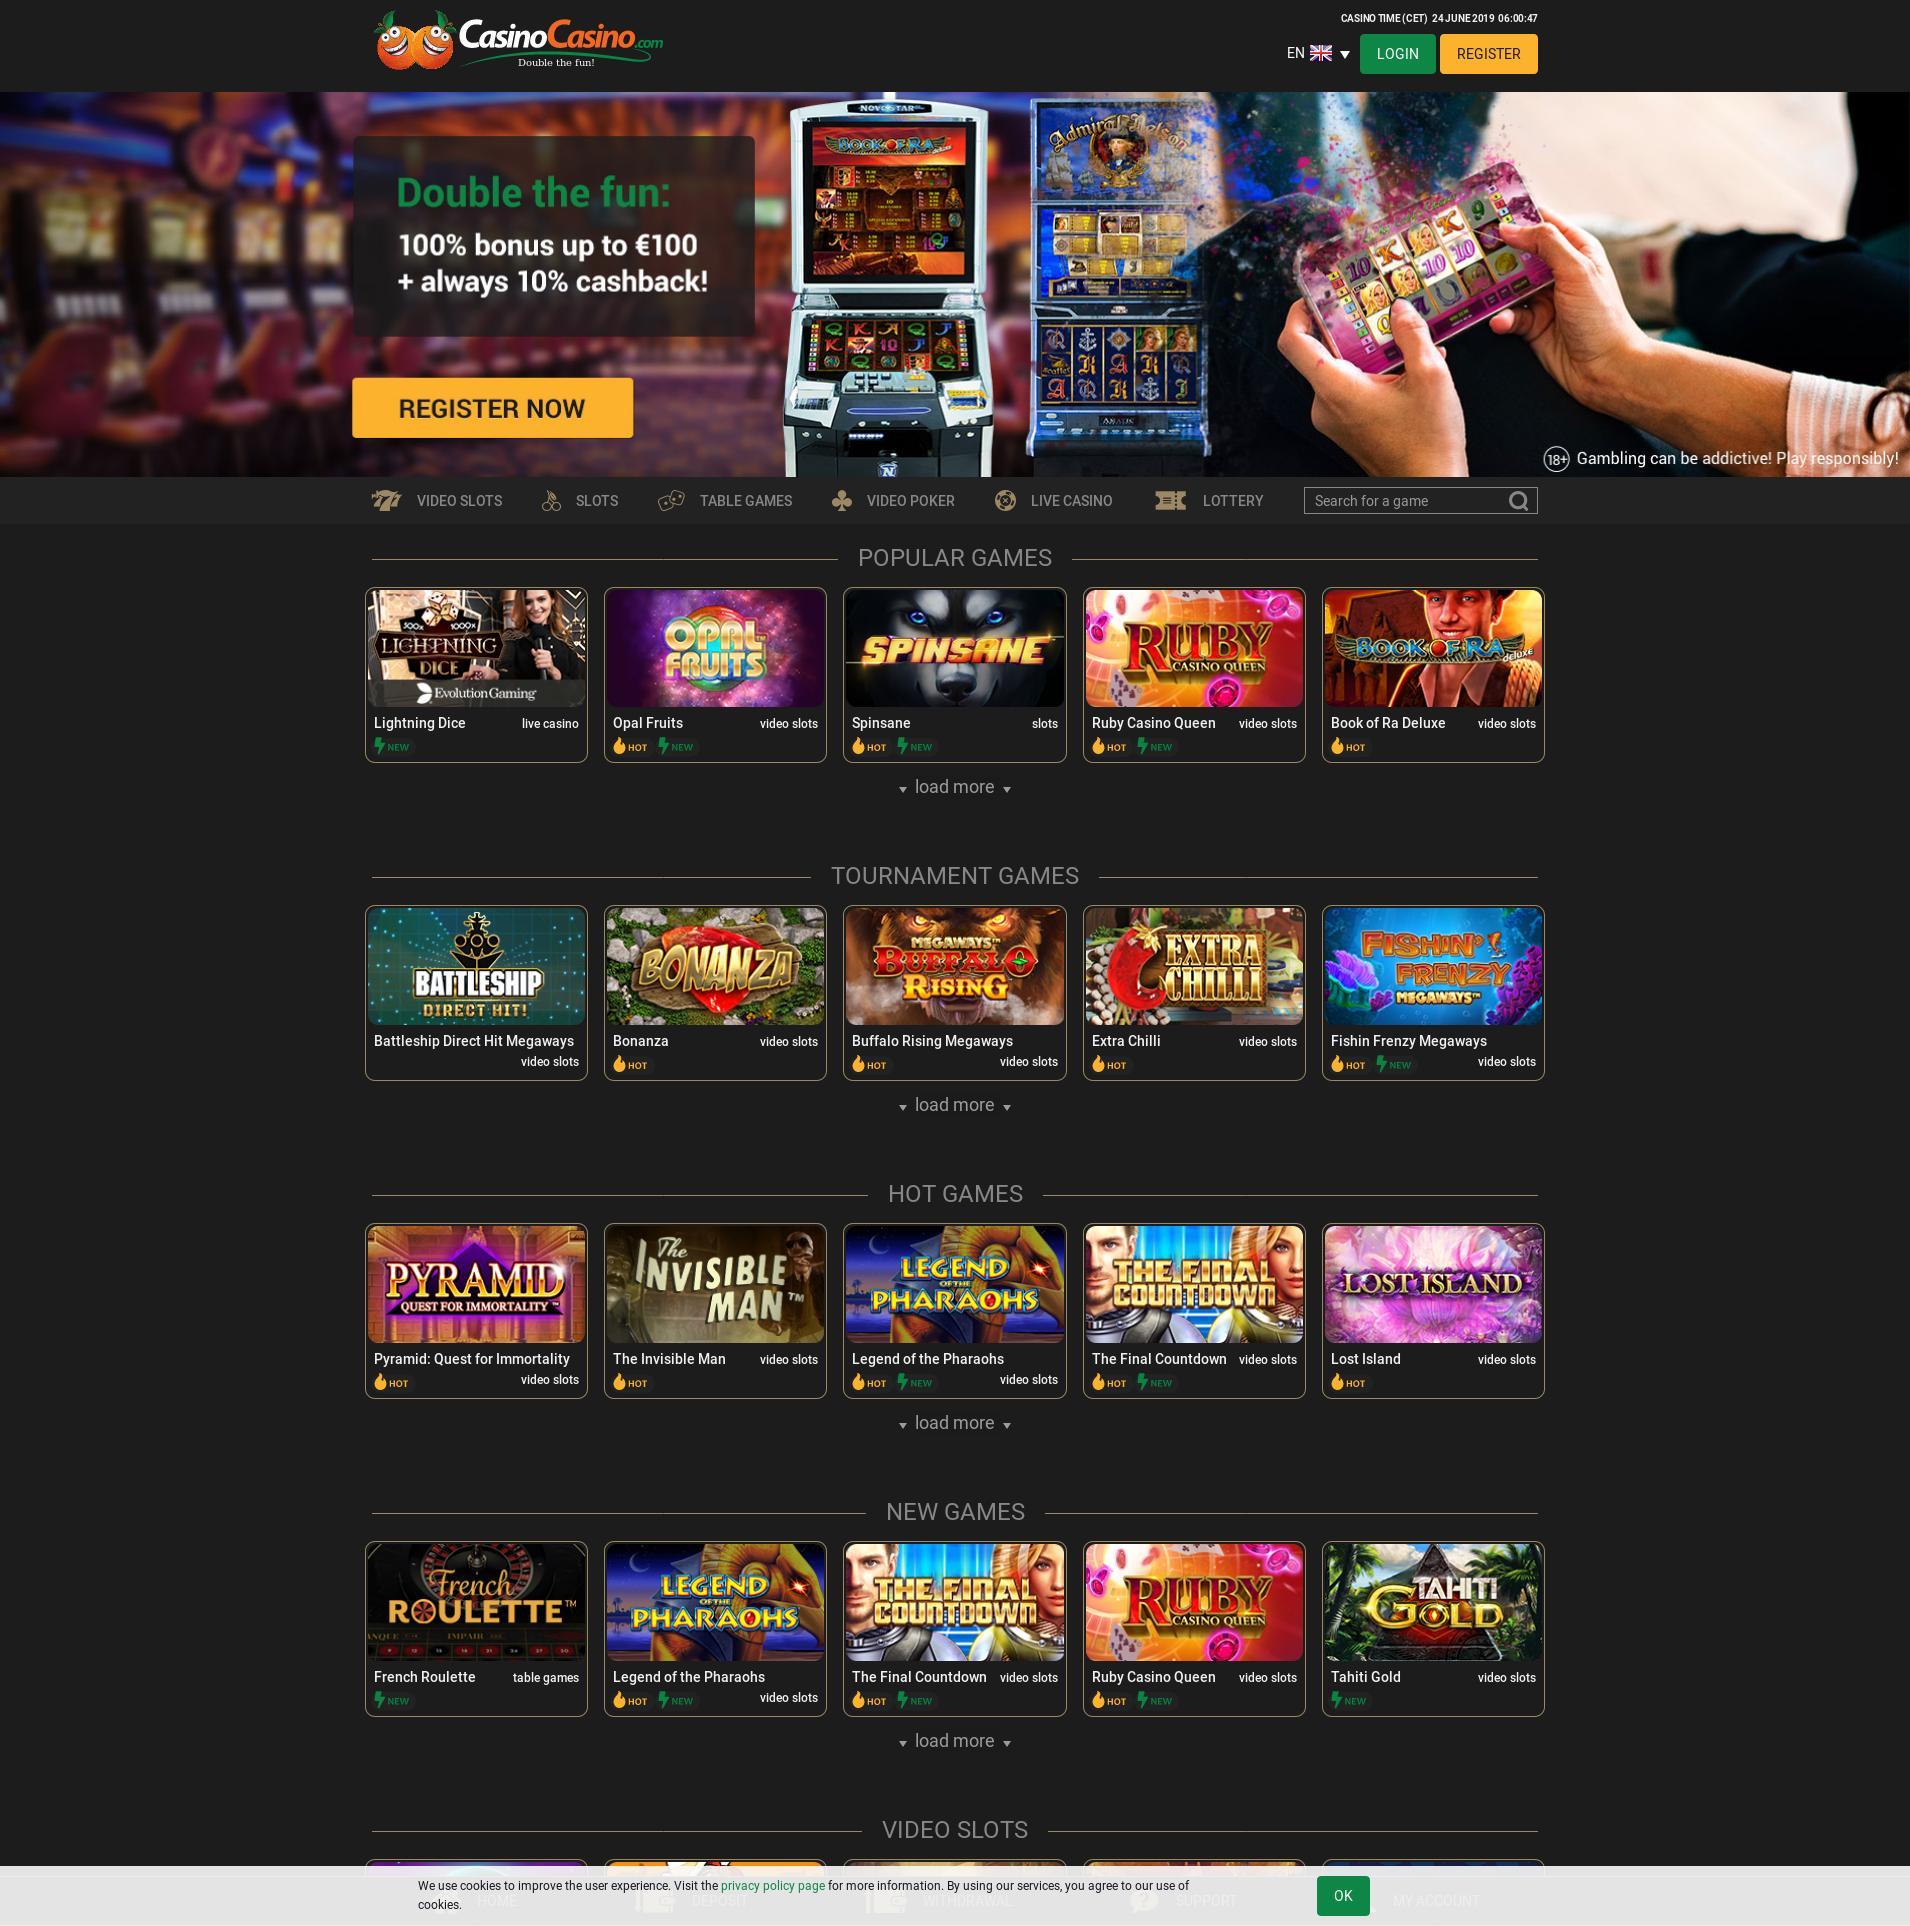 Casino skärm Lobby 2019-06-24 för Norge